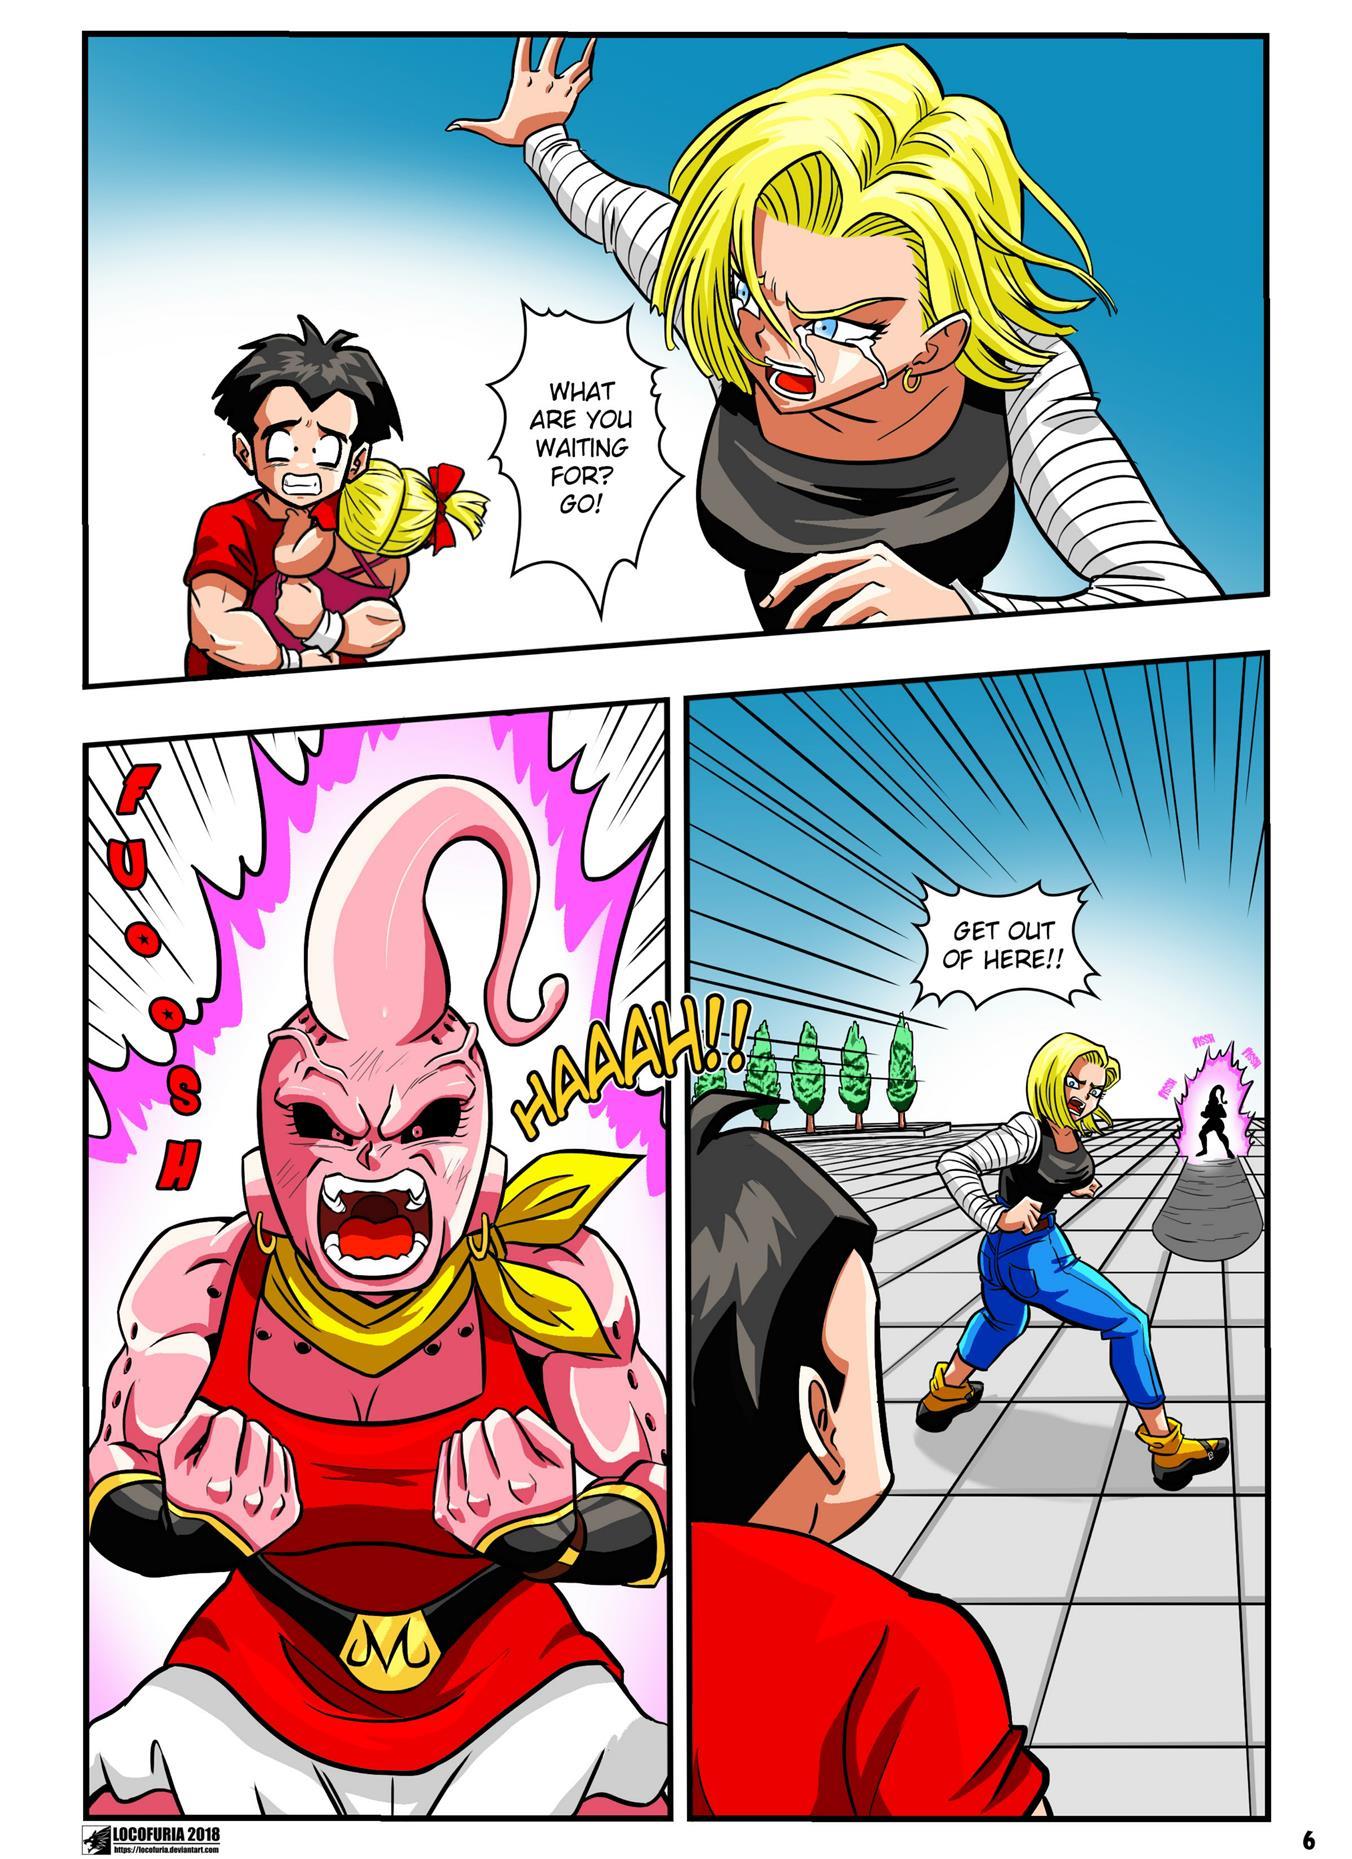 Buu's Bodies 3 (Dragon Ball Z) - Foto 8